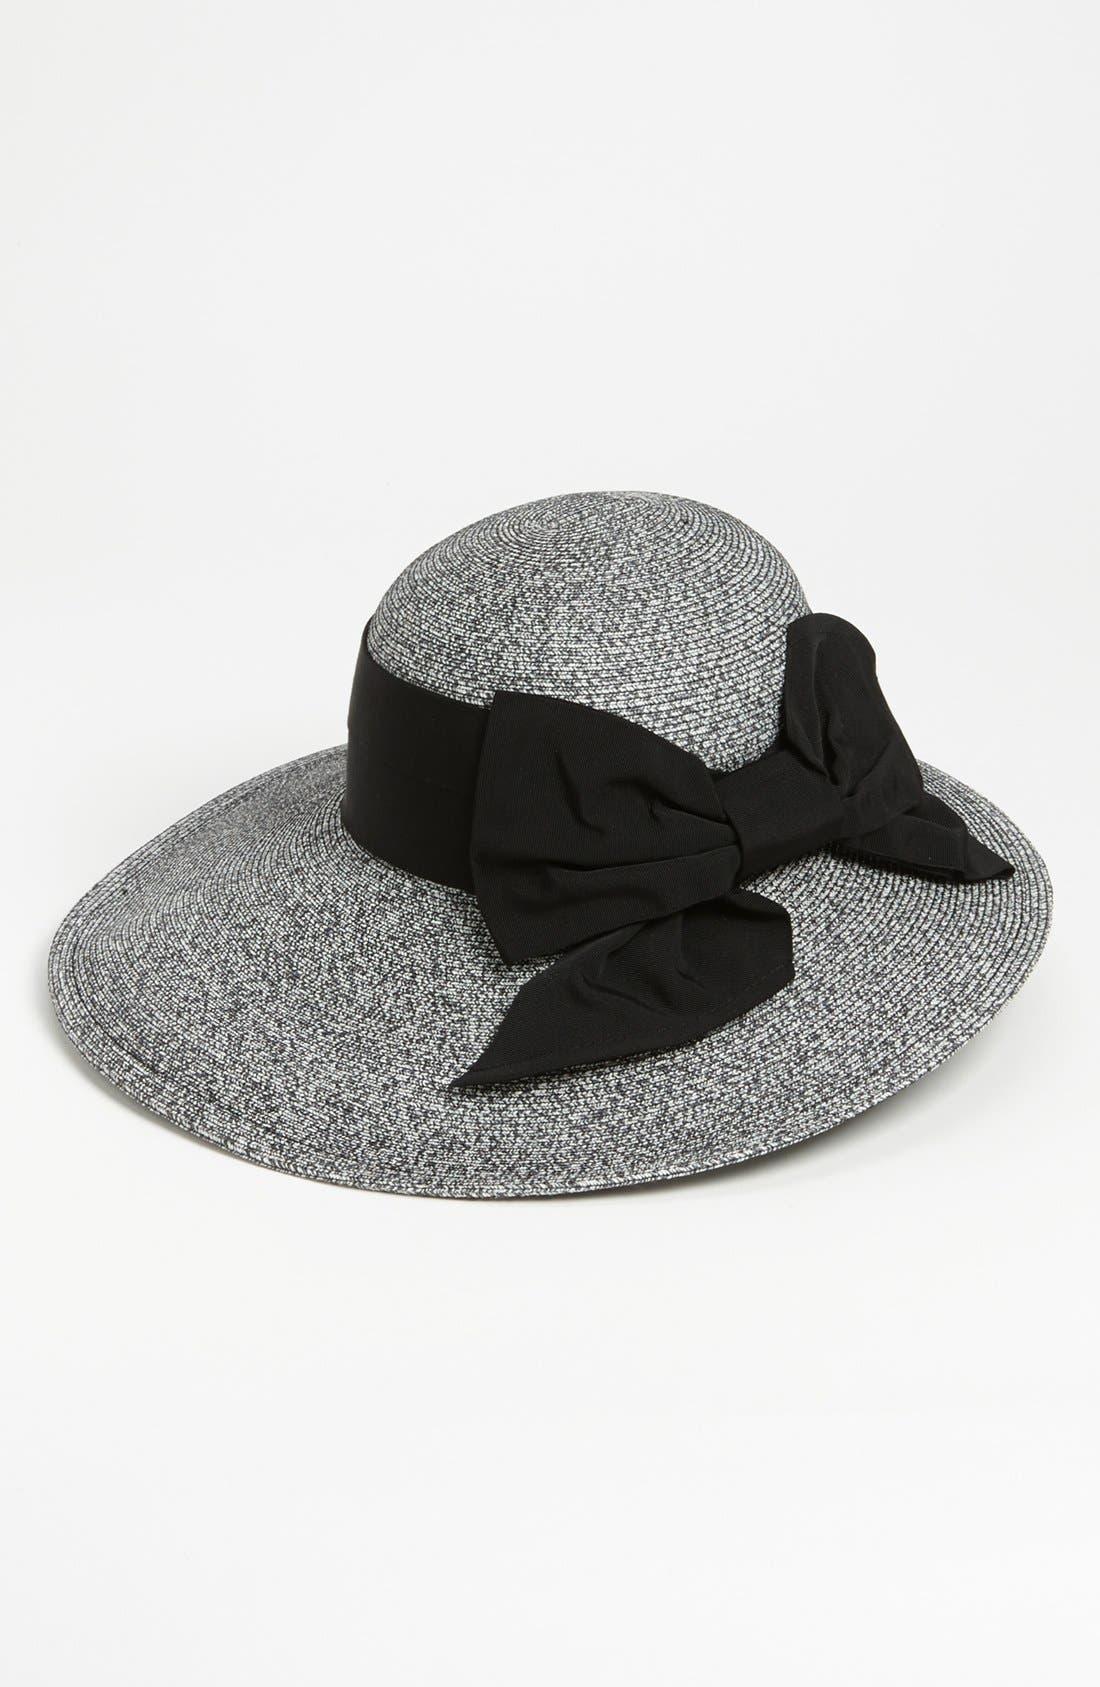 Alternate Image 1 Selected - Nordstrom Asymmetrical Straw Hat